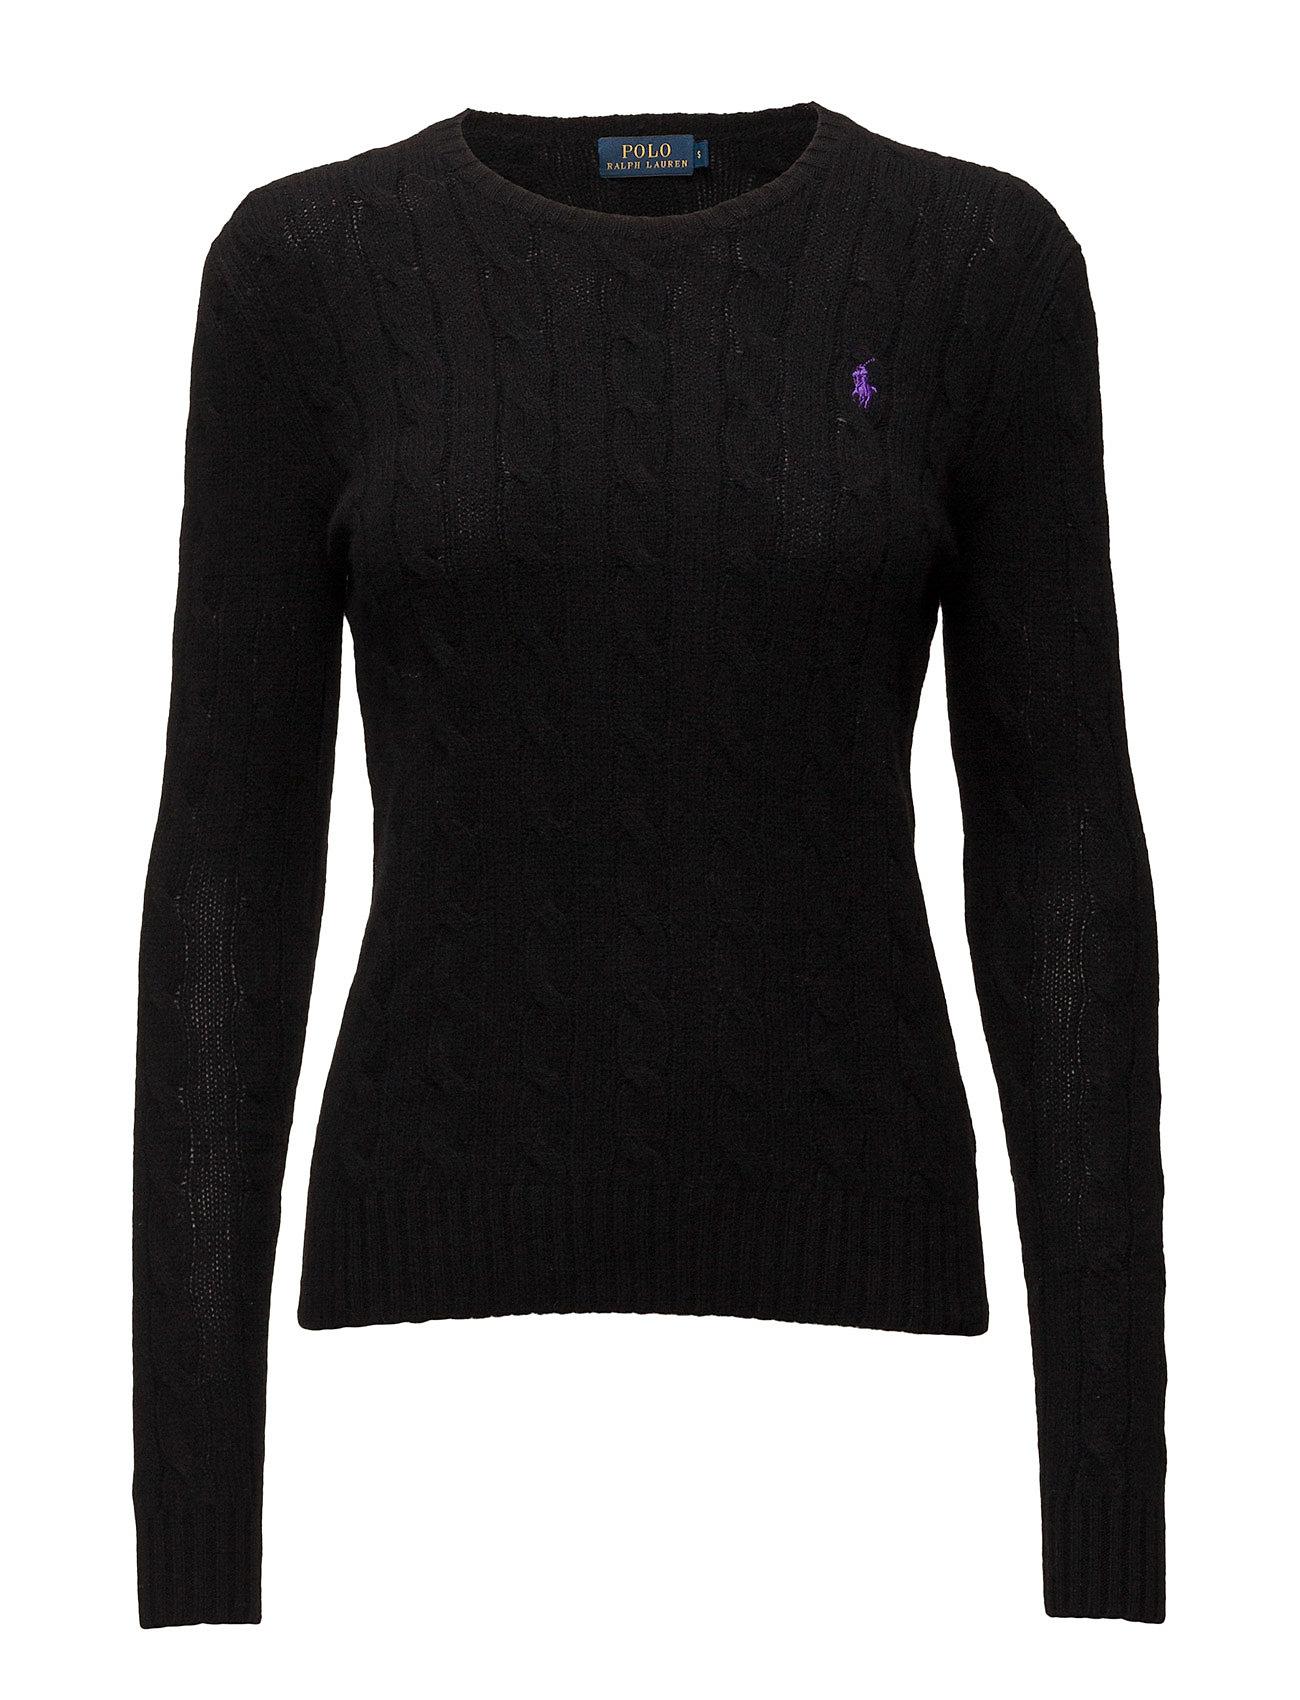 Polo Ralph Lauren Wool-Cashmere Crewneck Sweater - POLO BLACK